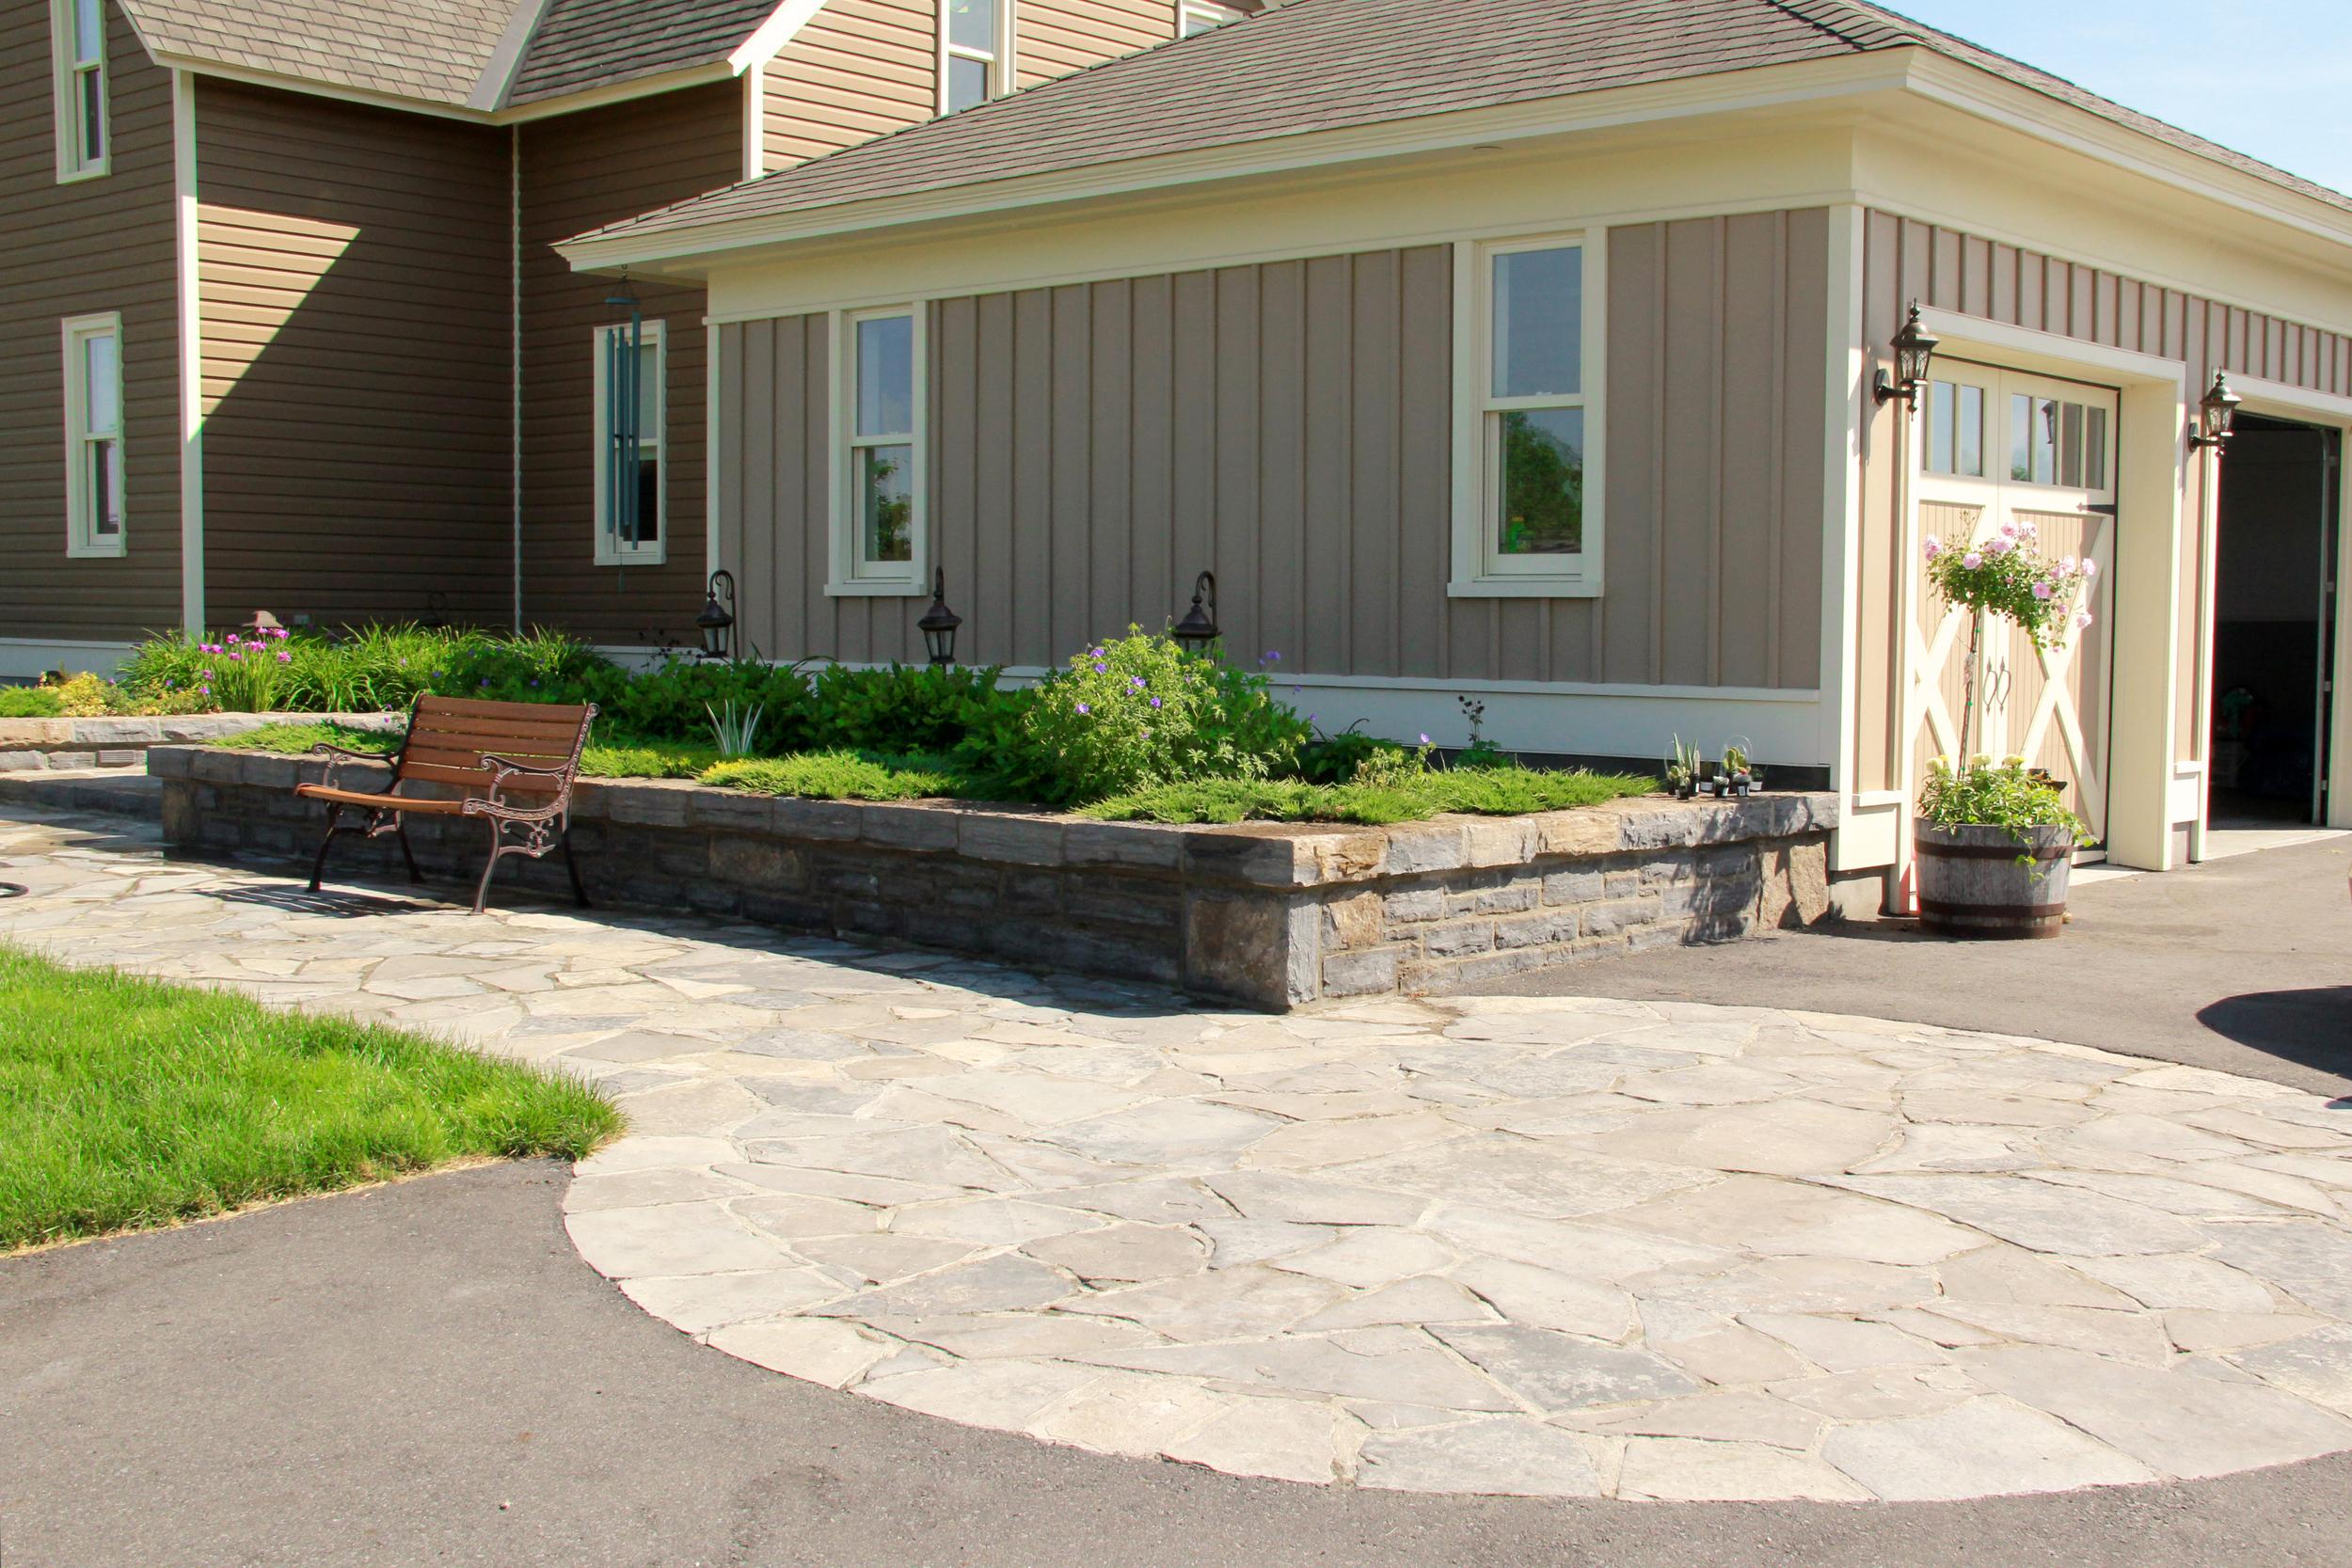 Country Home | Landscape Design | Landscaping | Riverview Design Solutions | Prescott, Ontario, Canada